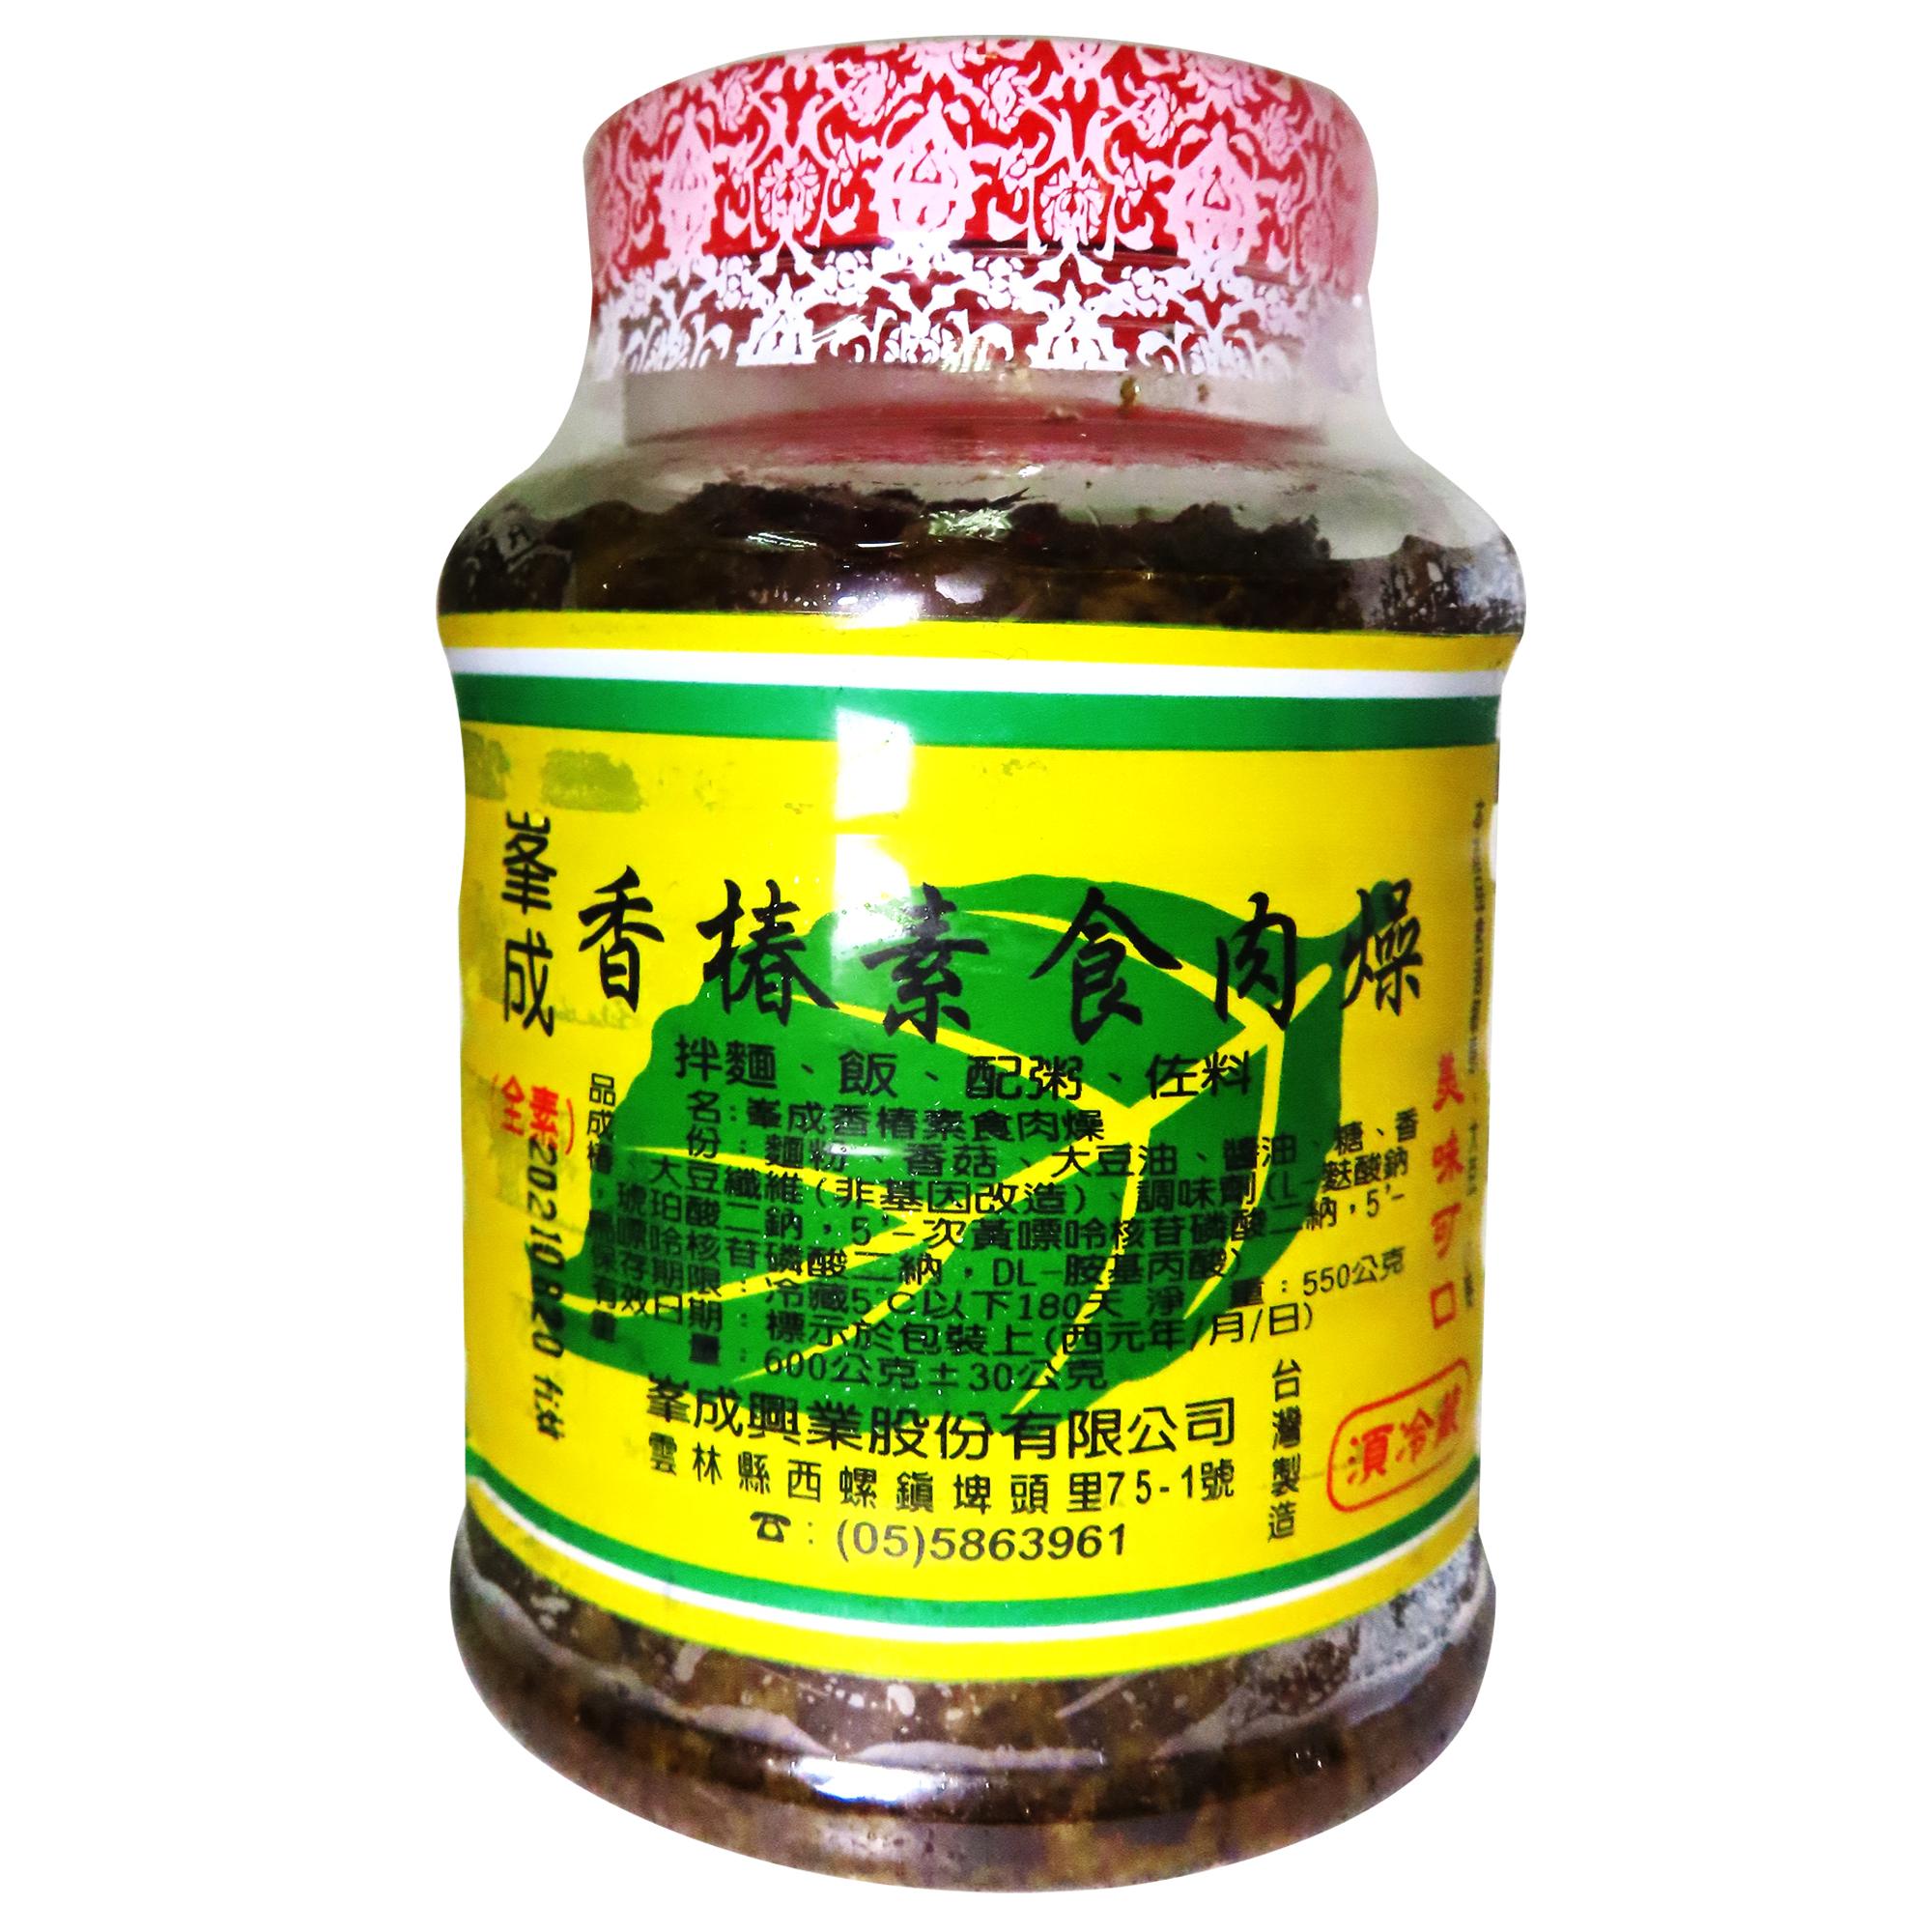 Image Cedar Minced Mushroom Rou Zao 峯成 - 香椿肉燥 600grams